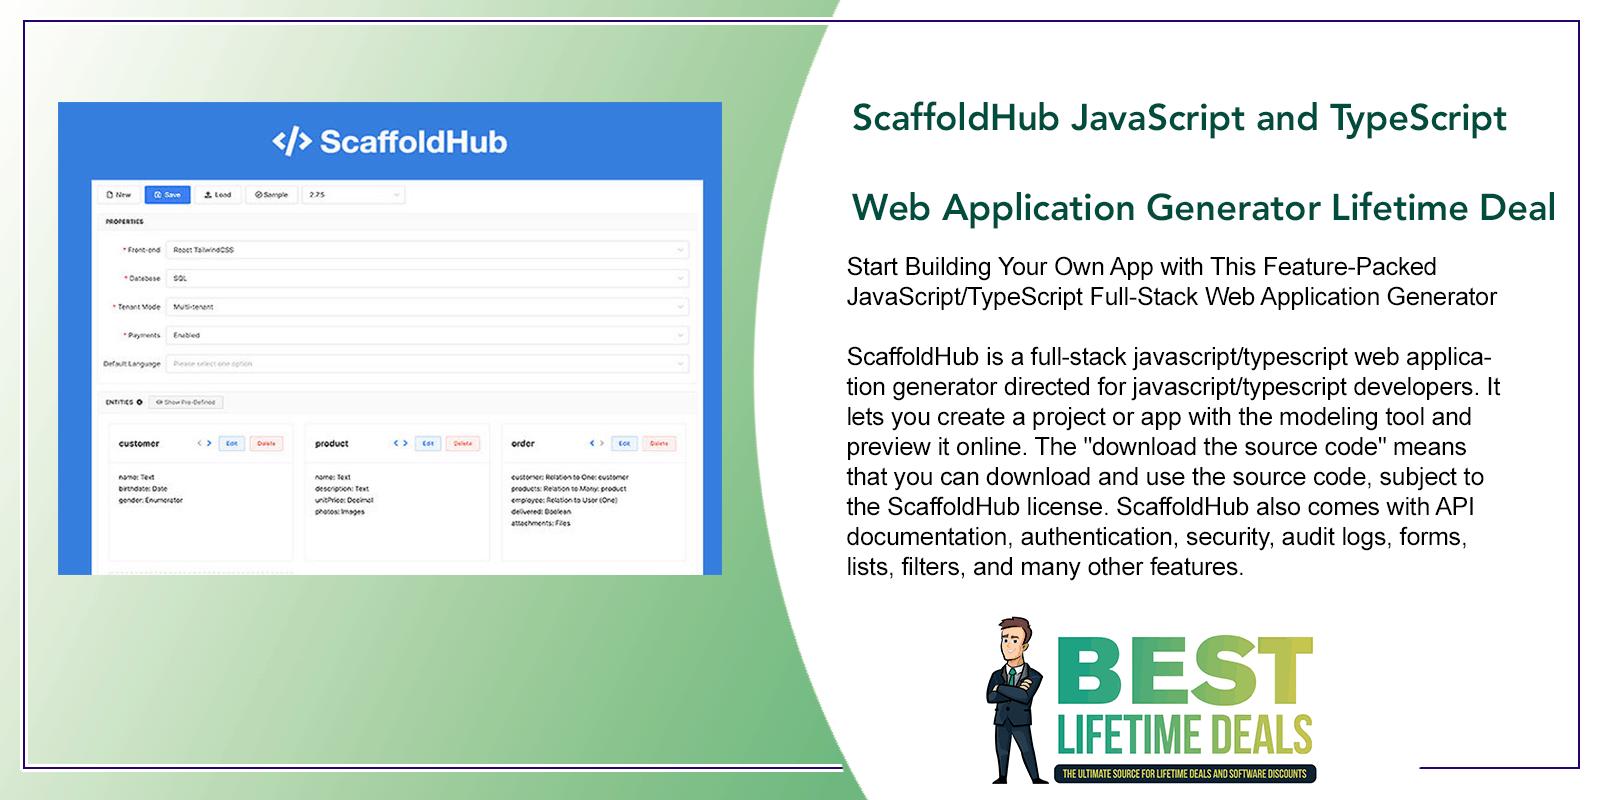 ScaffoldHub Developer Plan JavaScript and TypeScript Web Application Generator Featured Image